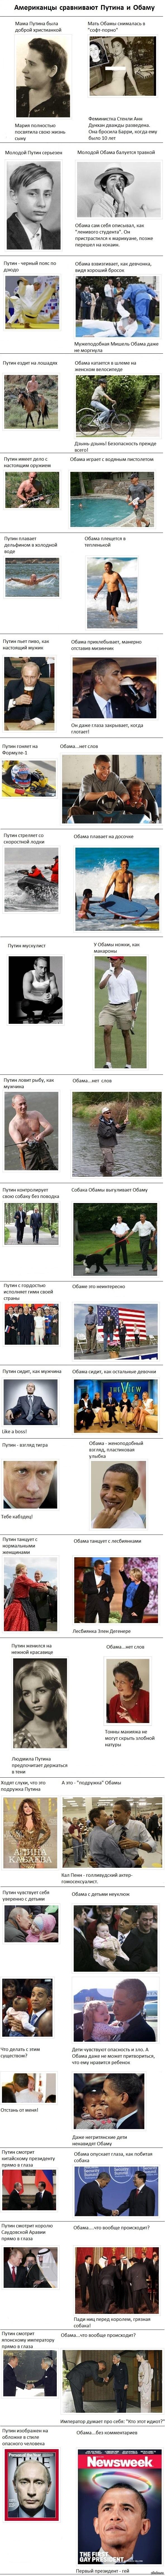 ���������� ���������� ������ � ����� ����� ����������. ������� �� ���. �������� ����� http://www.tomatobubble.com/putin_obama.html